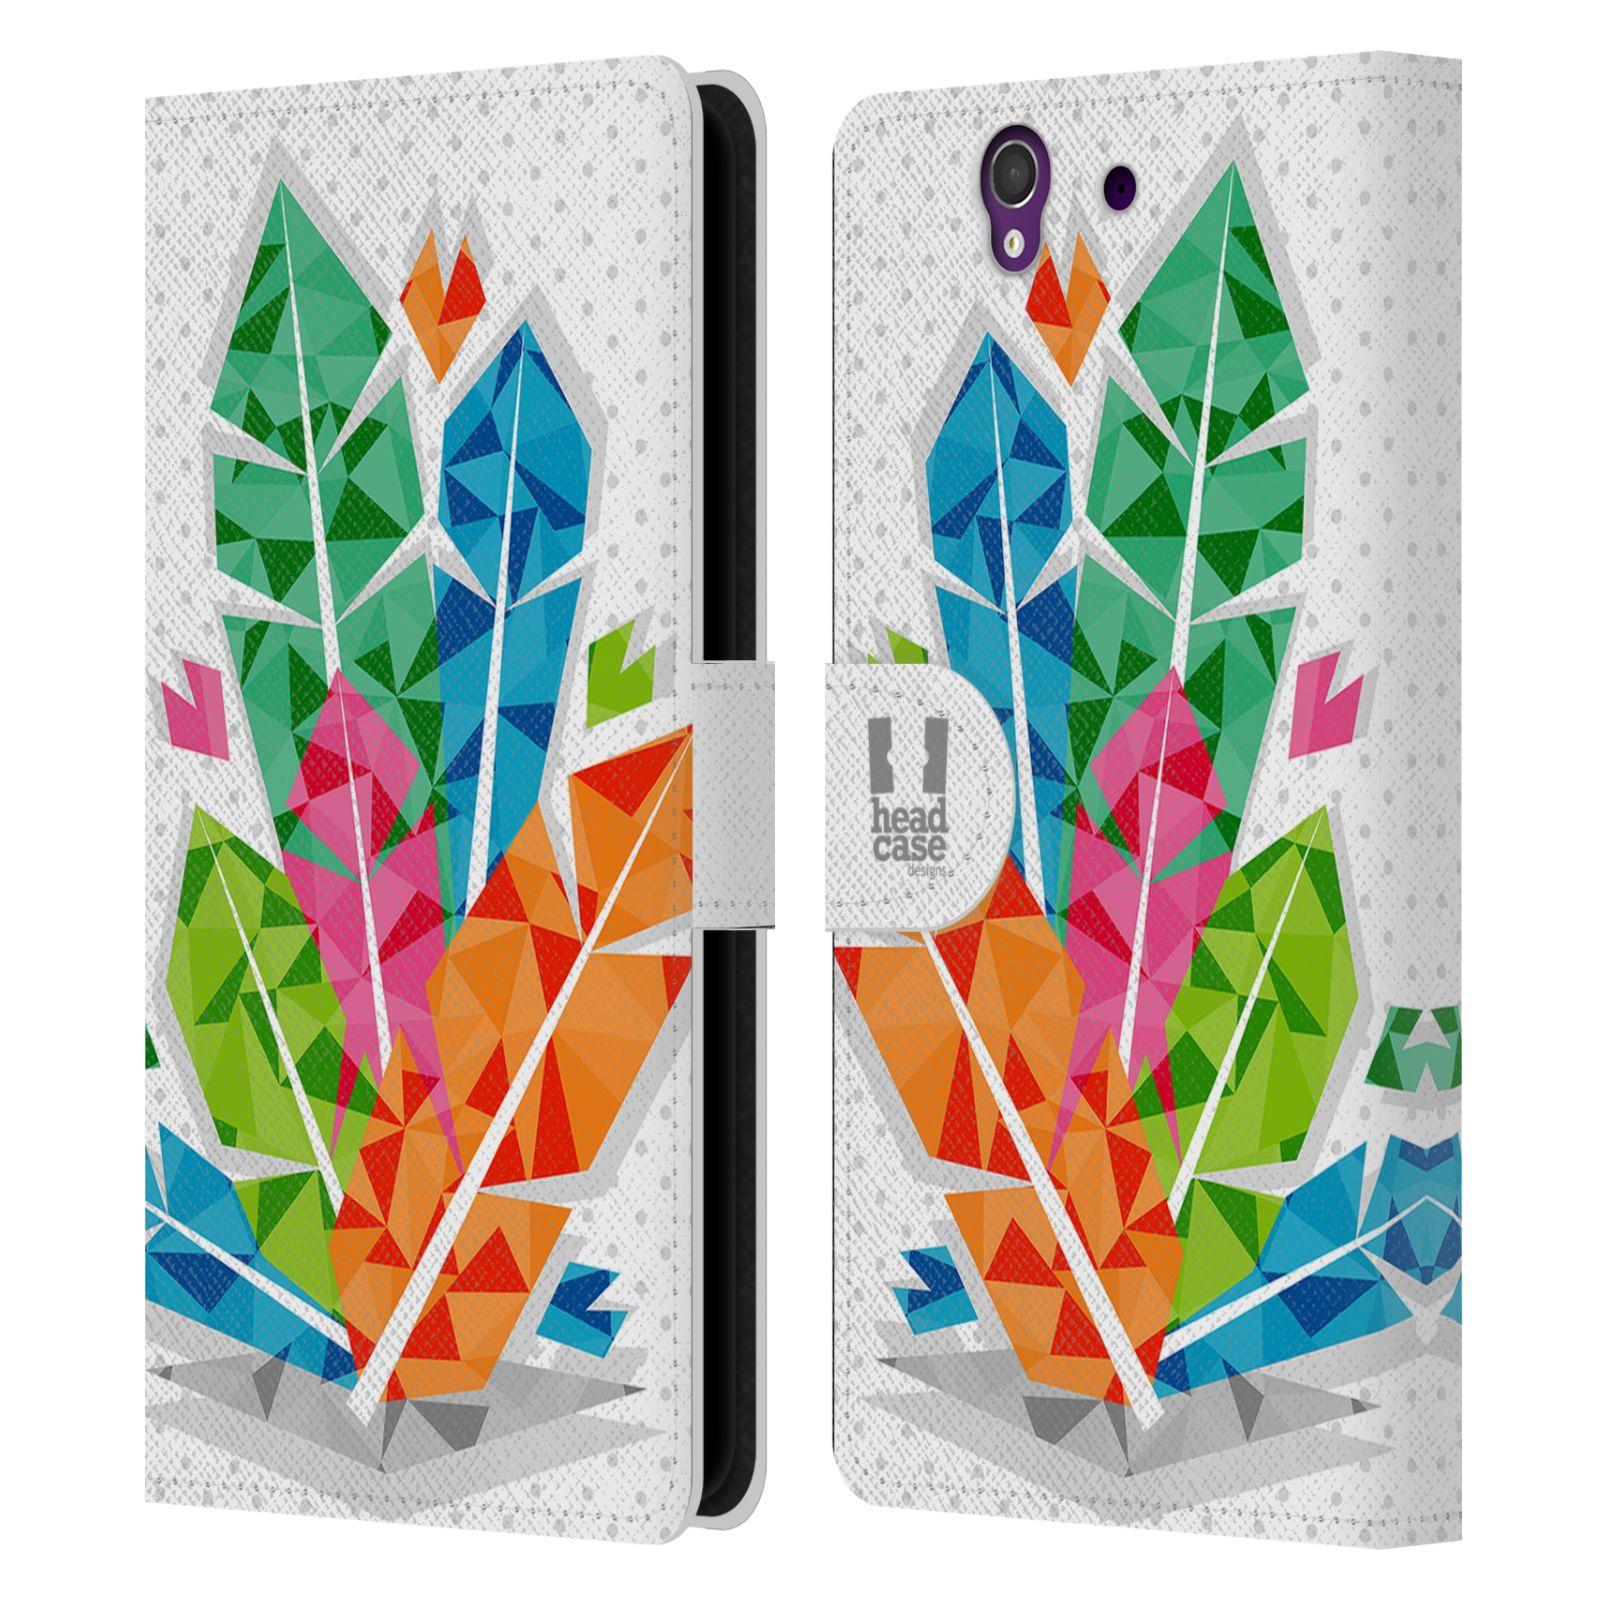 HEAD CASE Flipové pouzdro pro mobil SONY XPERIA Z (C6603) geometrická barevná pírka indián